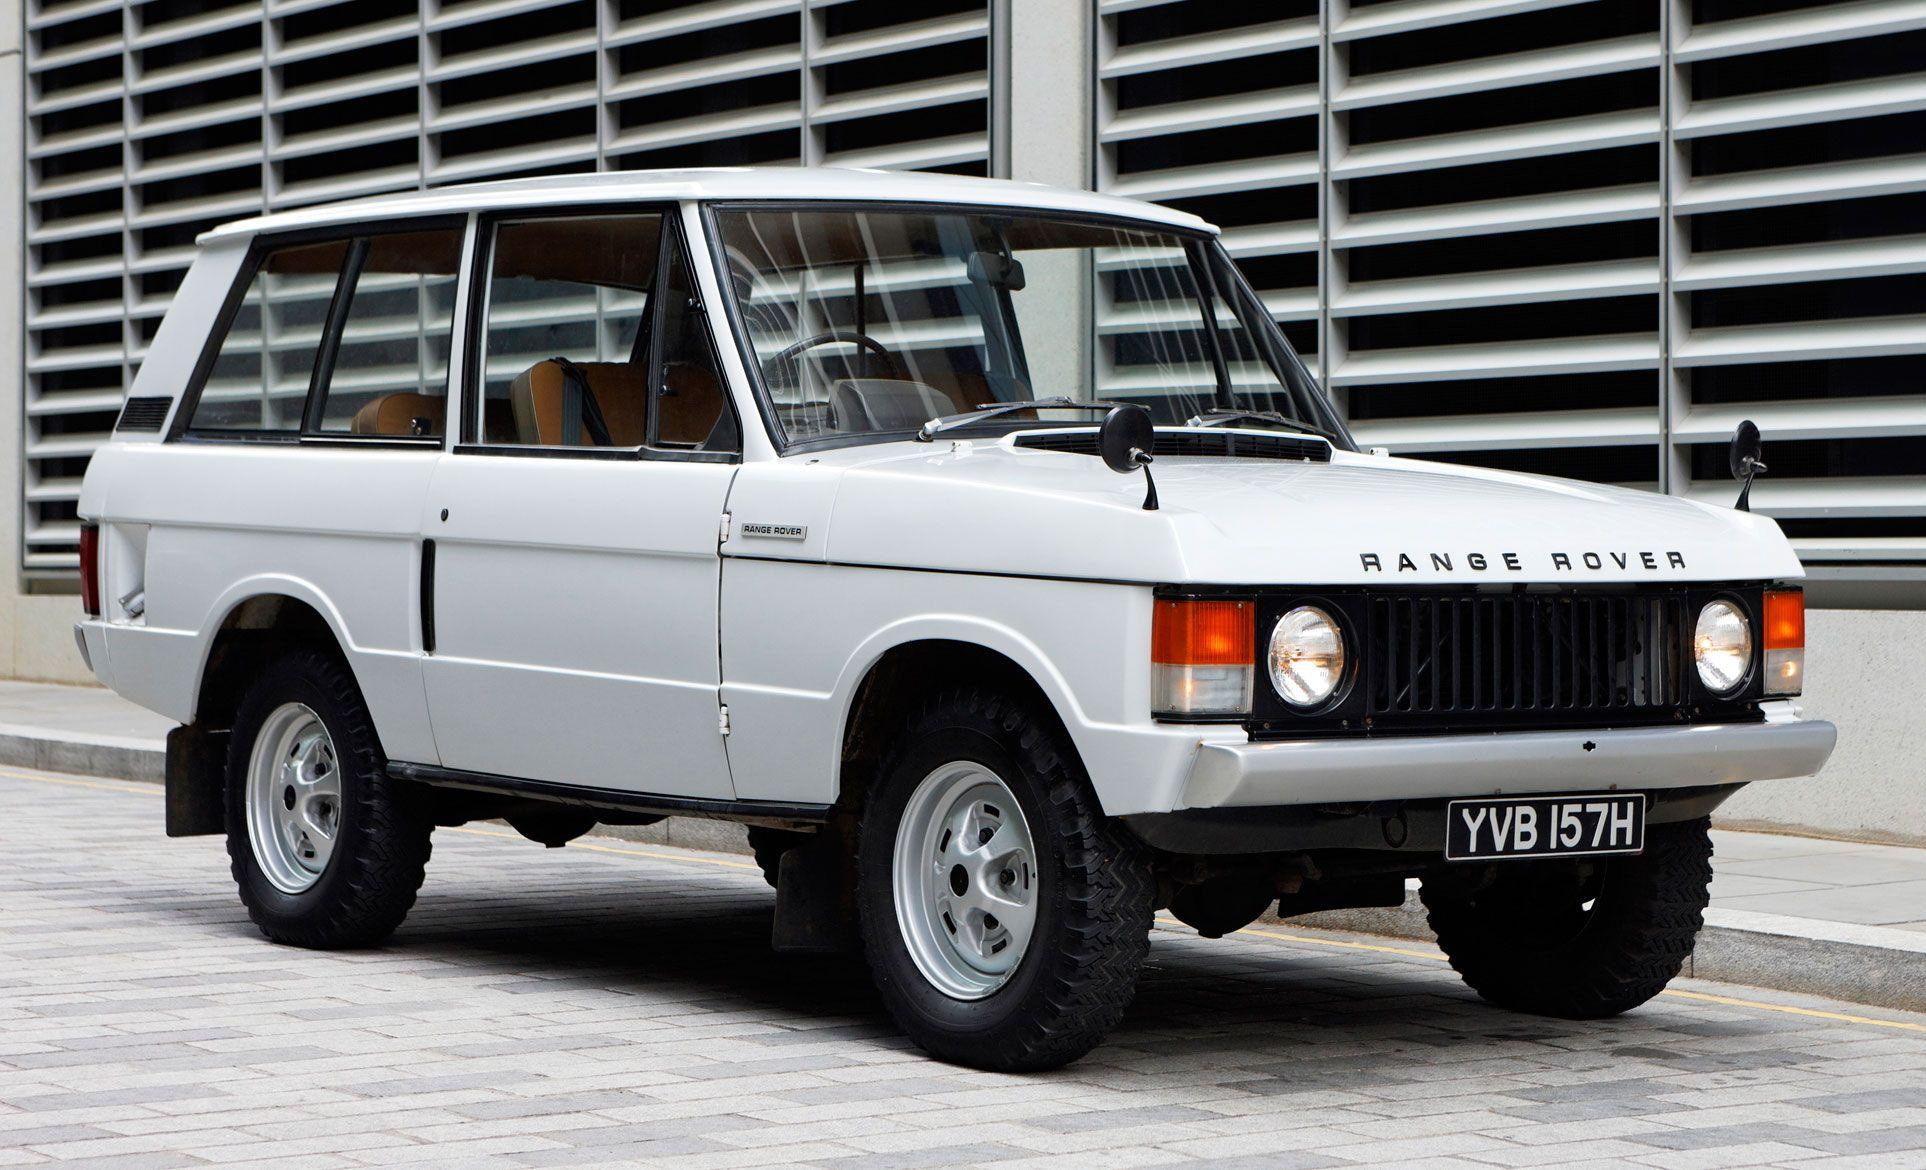 range rover classic cars range rover 3 doors 1970 1986 pint. Black Bedroom Furniture Sets. Home Design Ideas